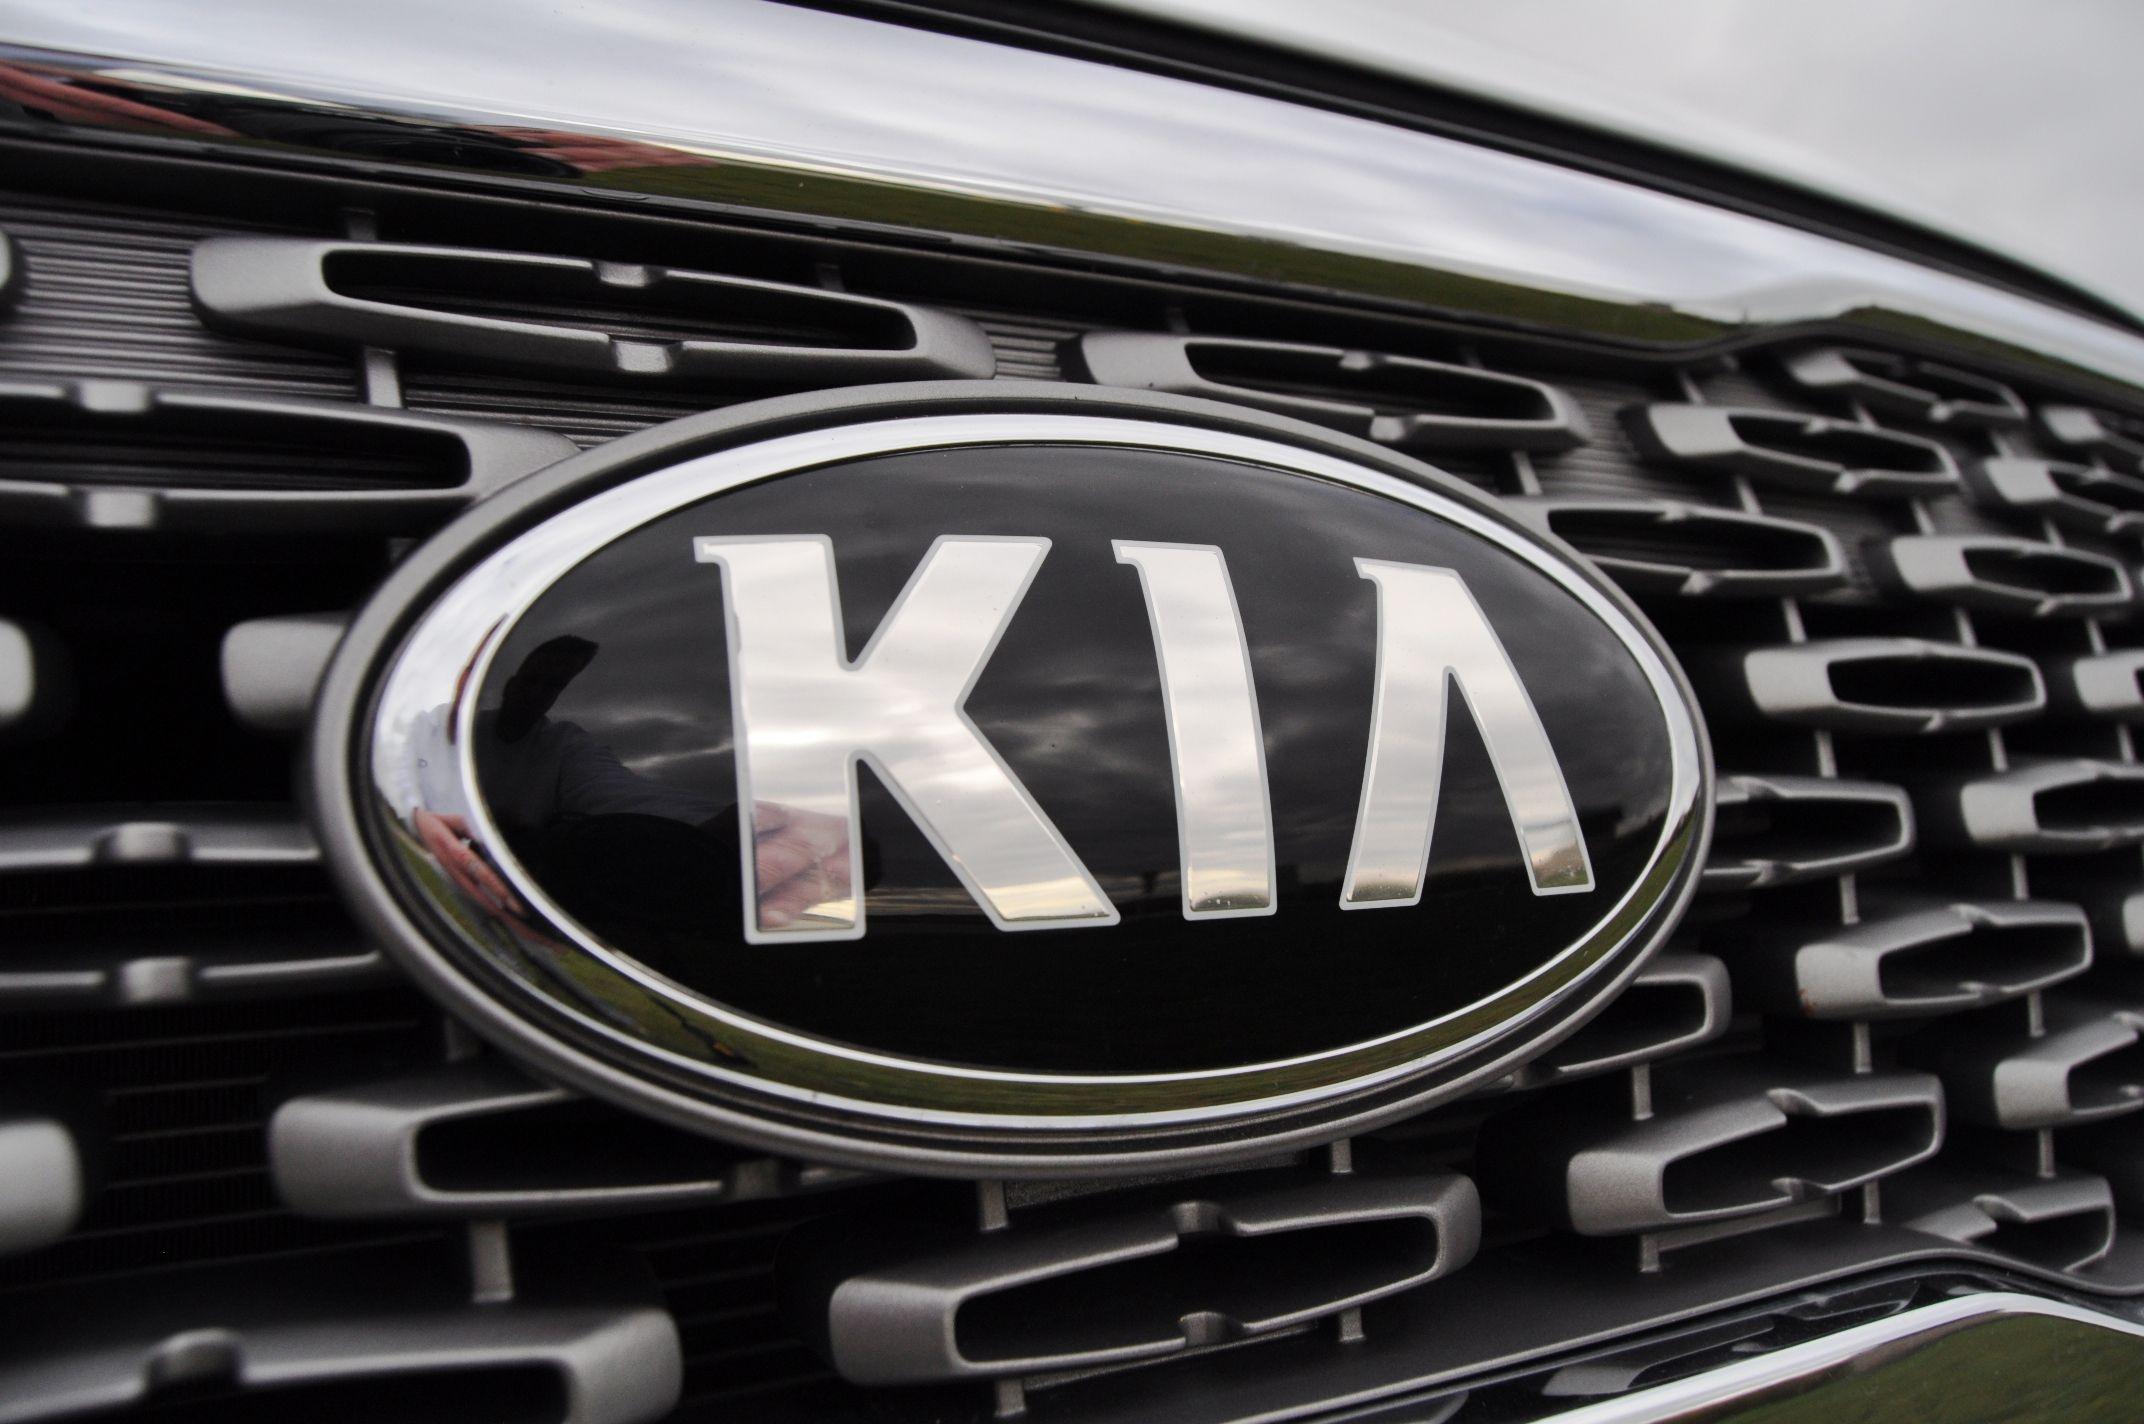 Kia Launches All New Kia Com With Help Of Brilliant Denuo